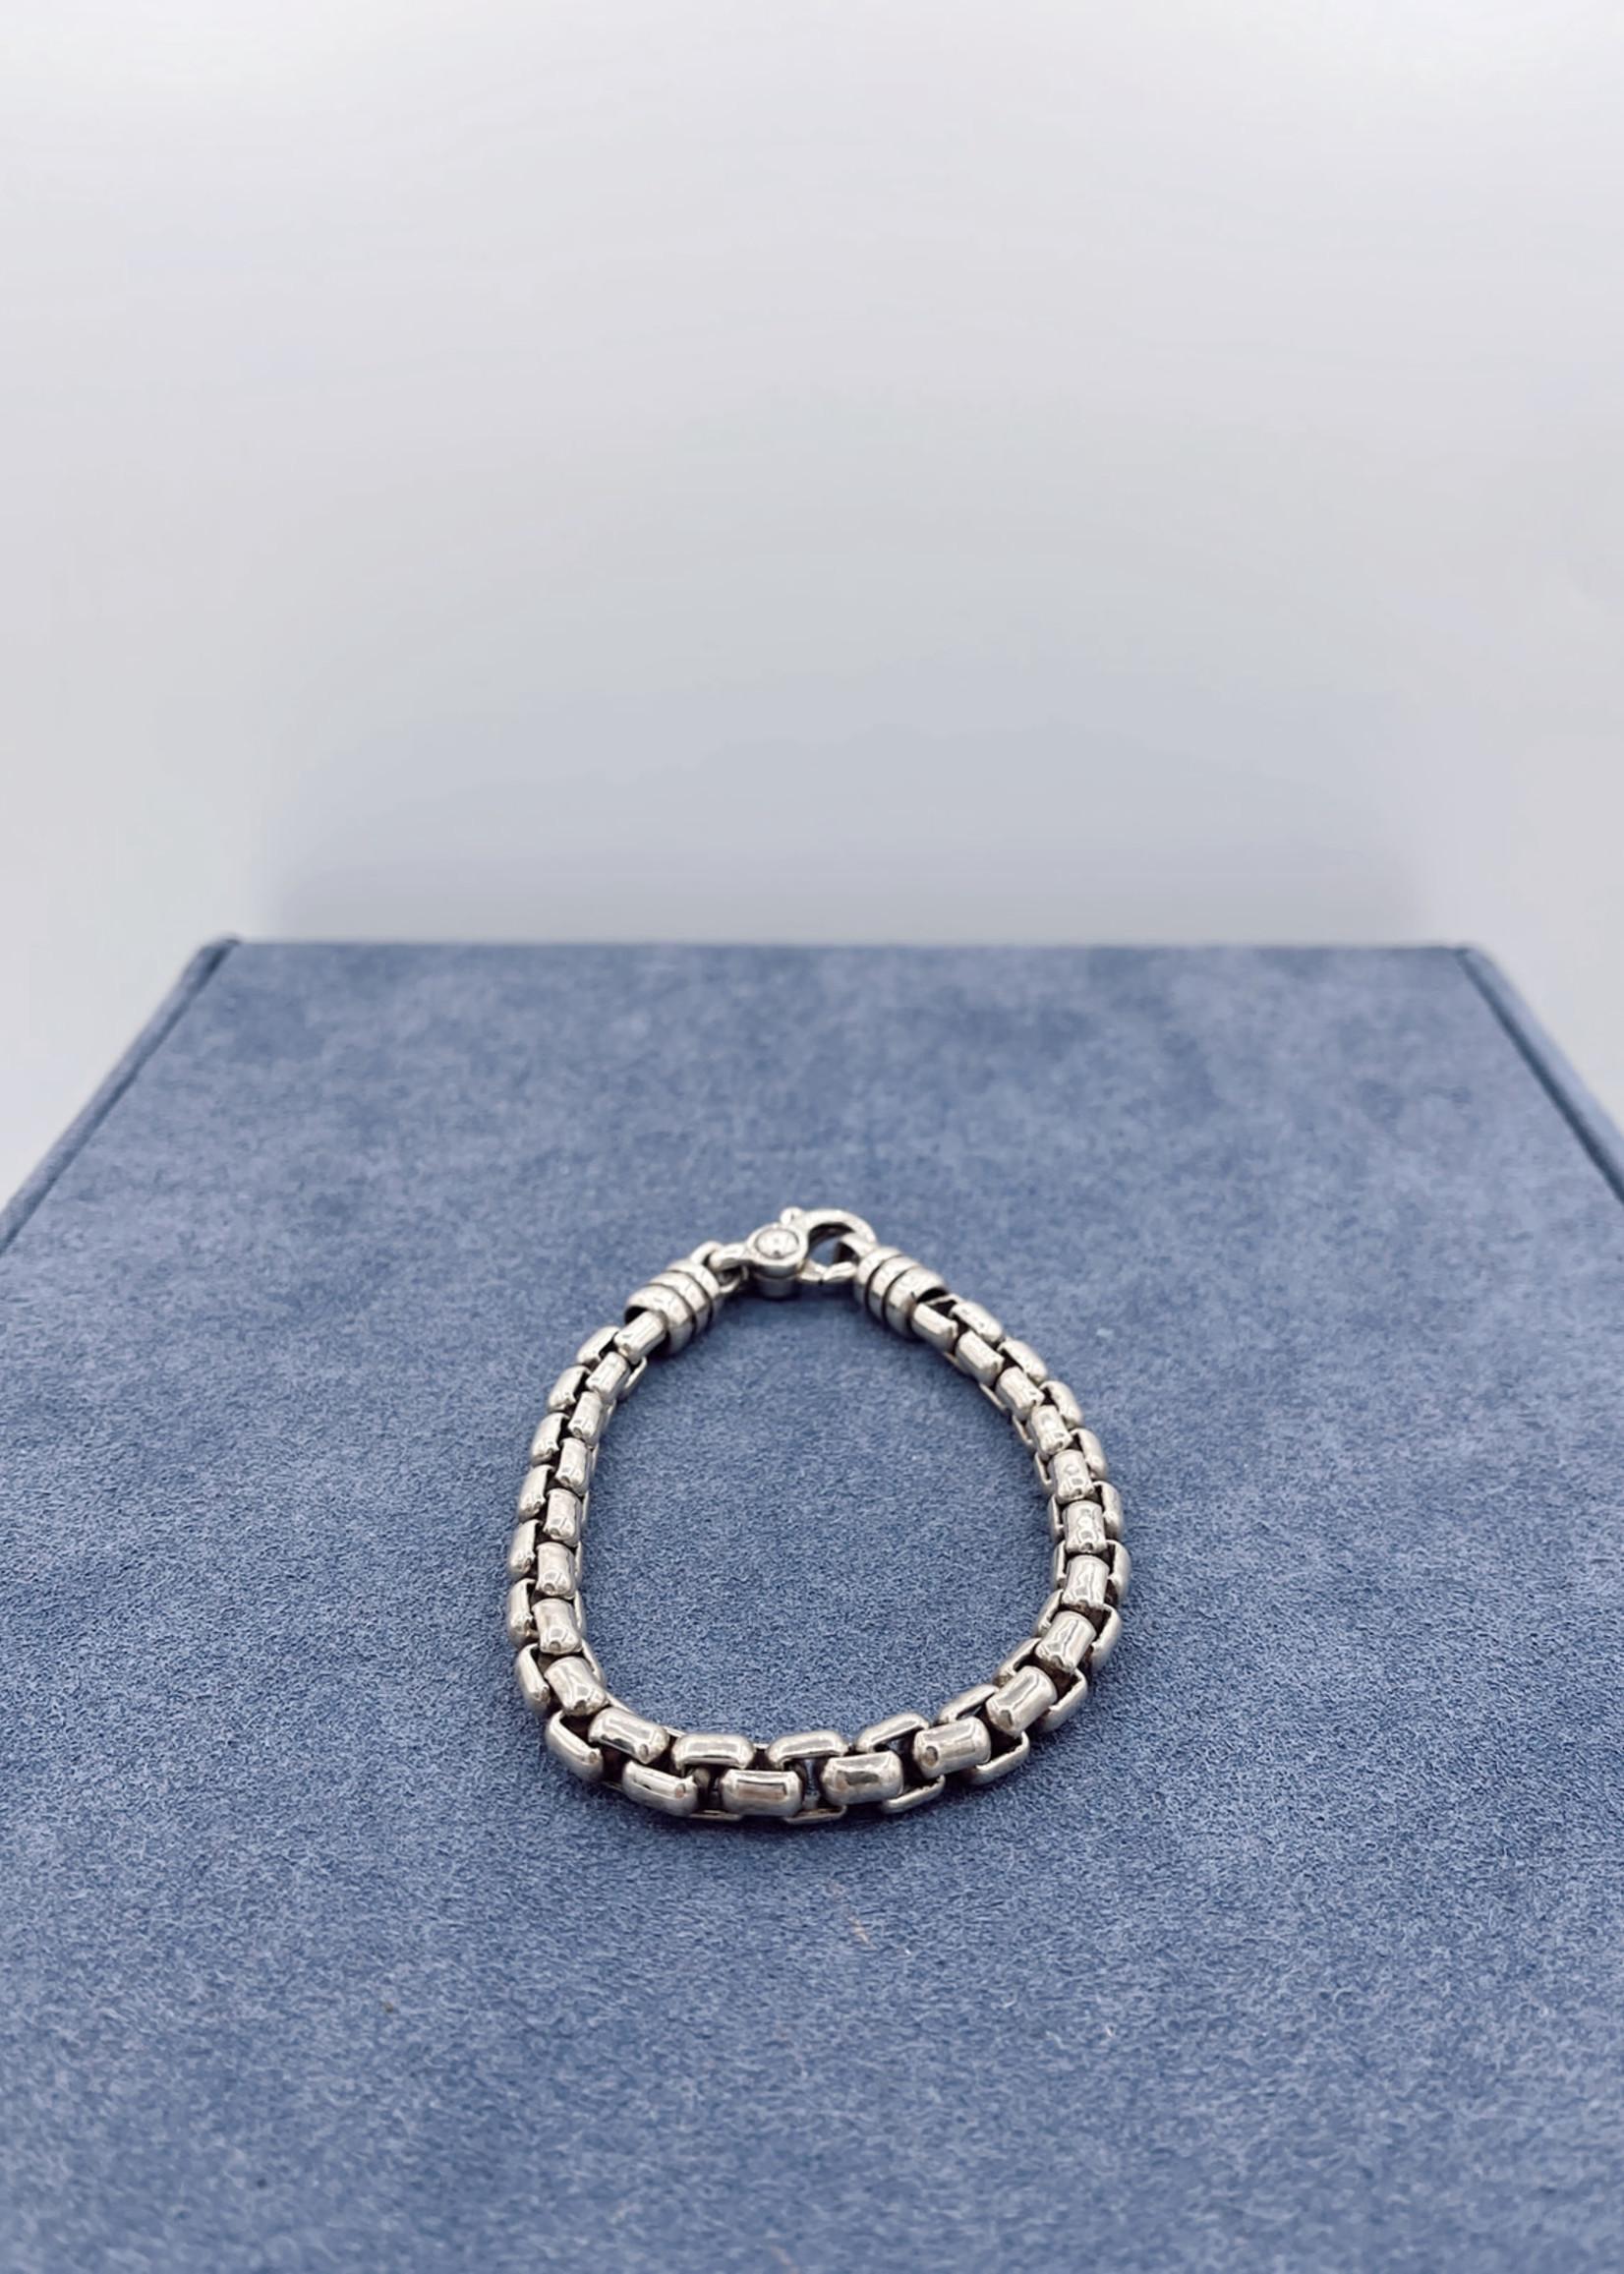 Zina Sterling Silver Stratus/Venitian Link Bracelet